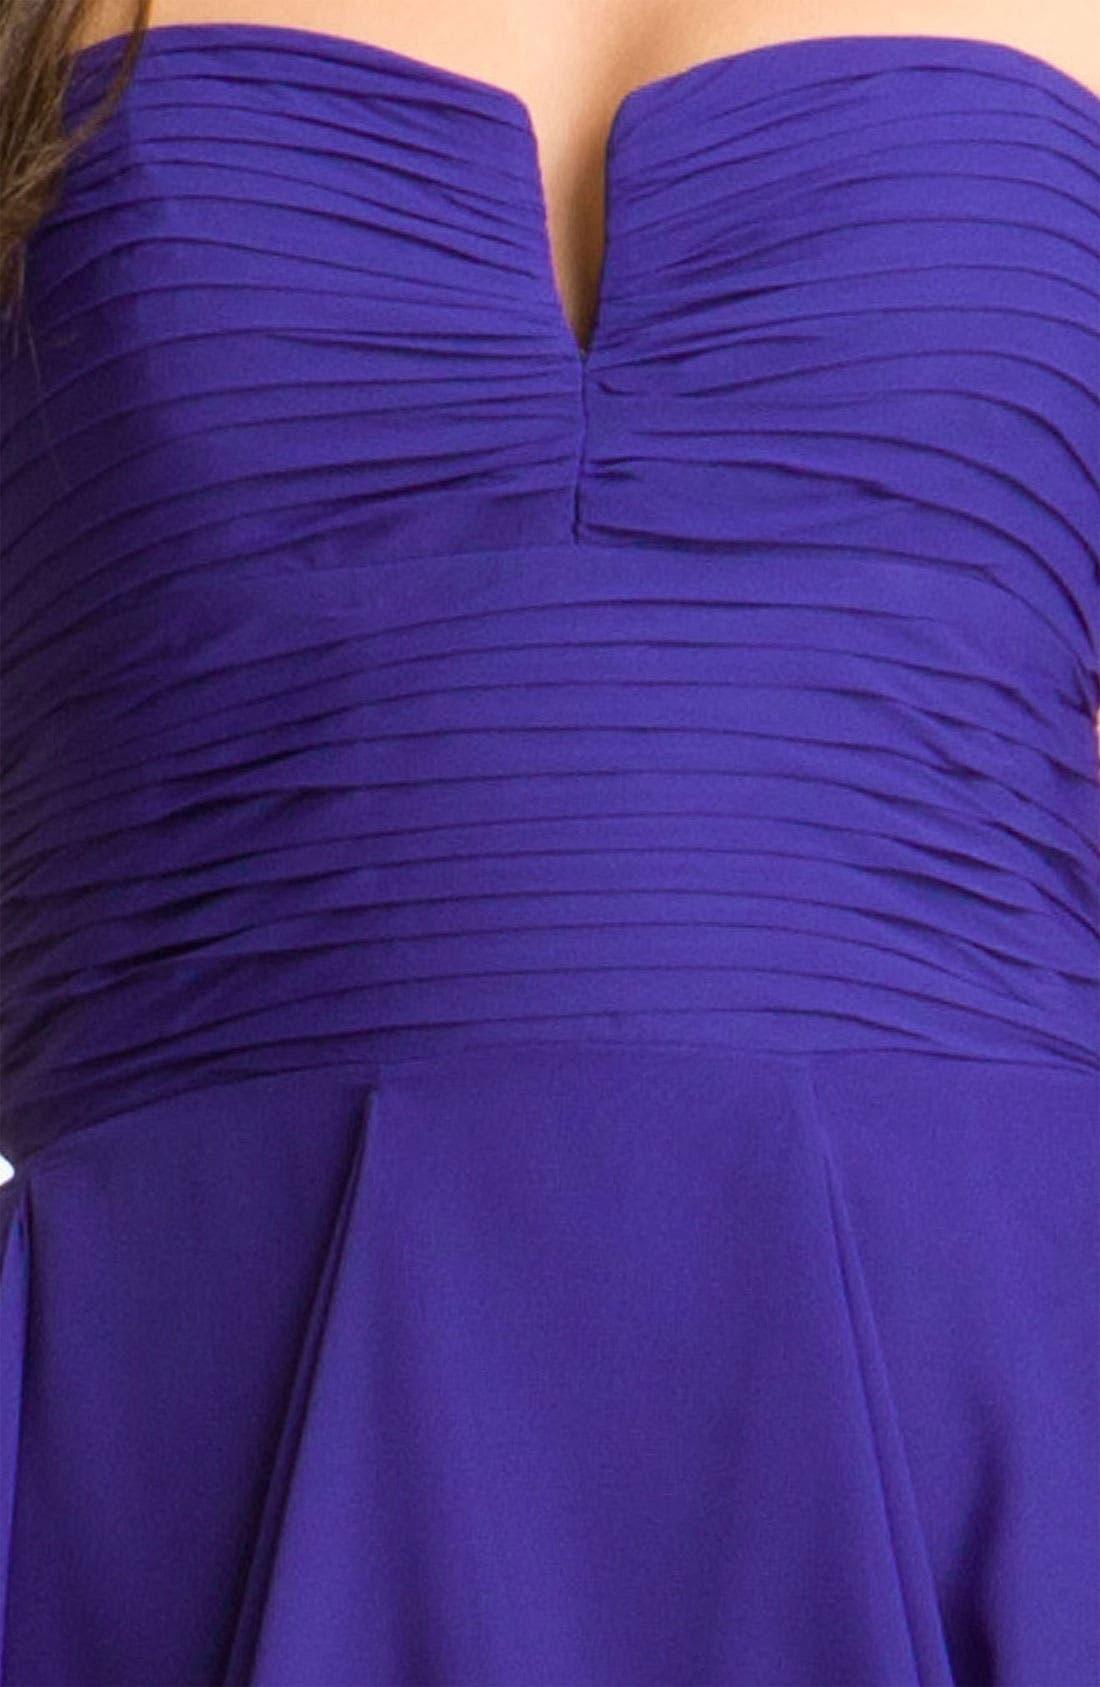 Alternate Image 3  - Hailey by Adrianna Papell Notched Bodice Chiffon Dress